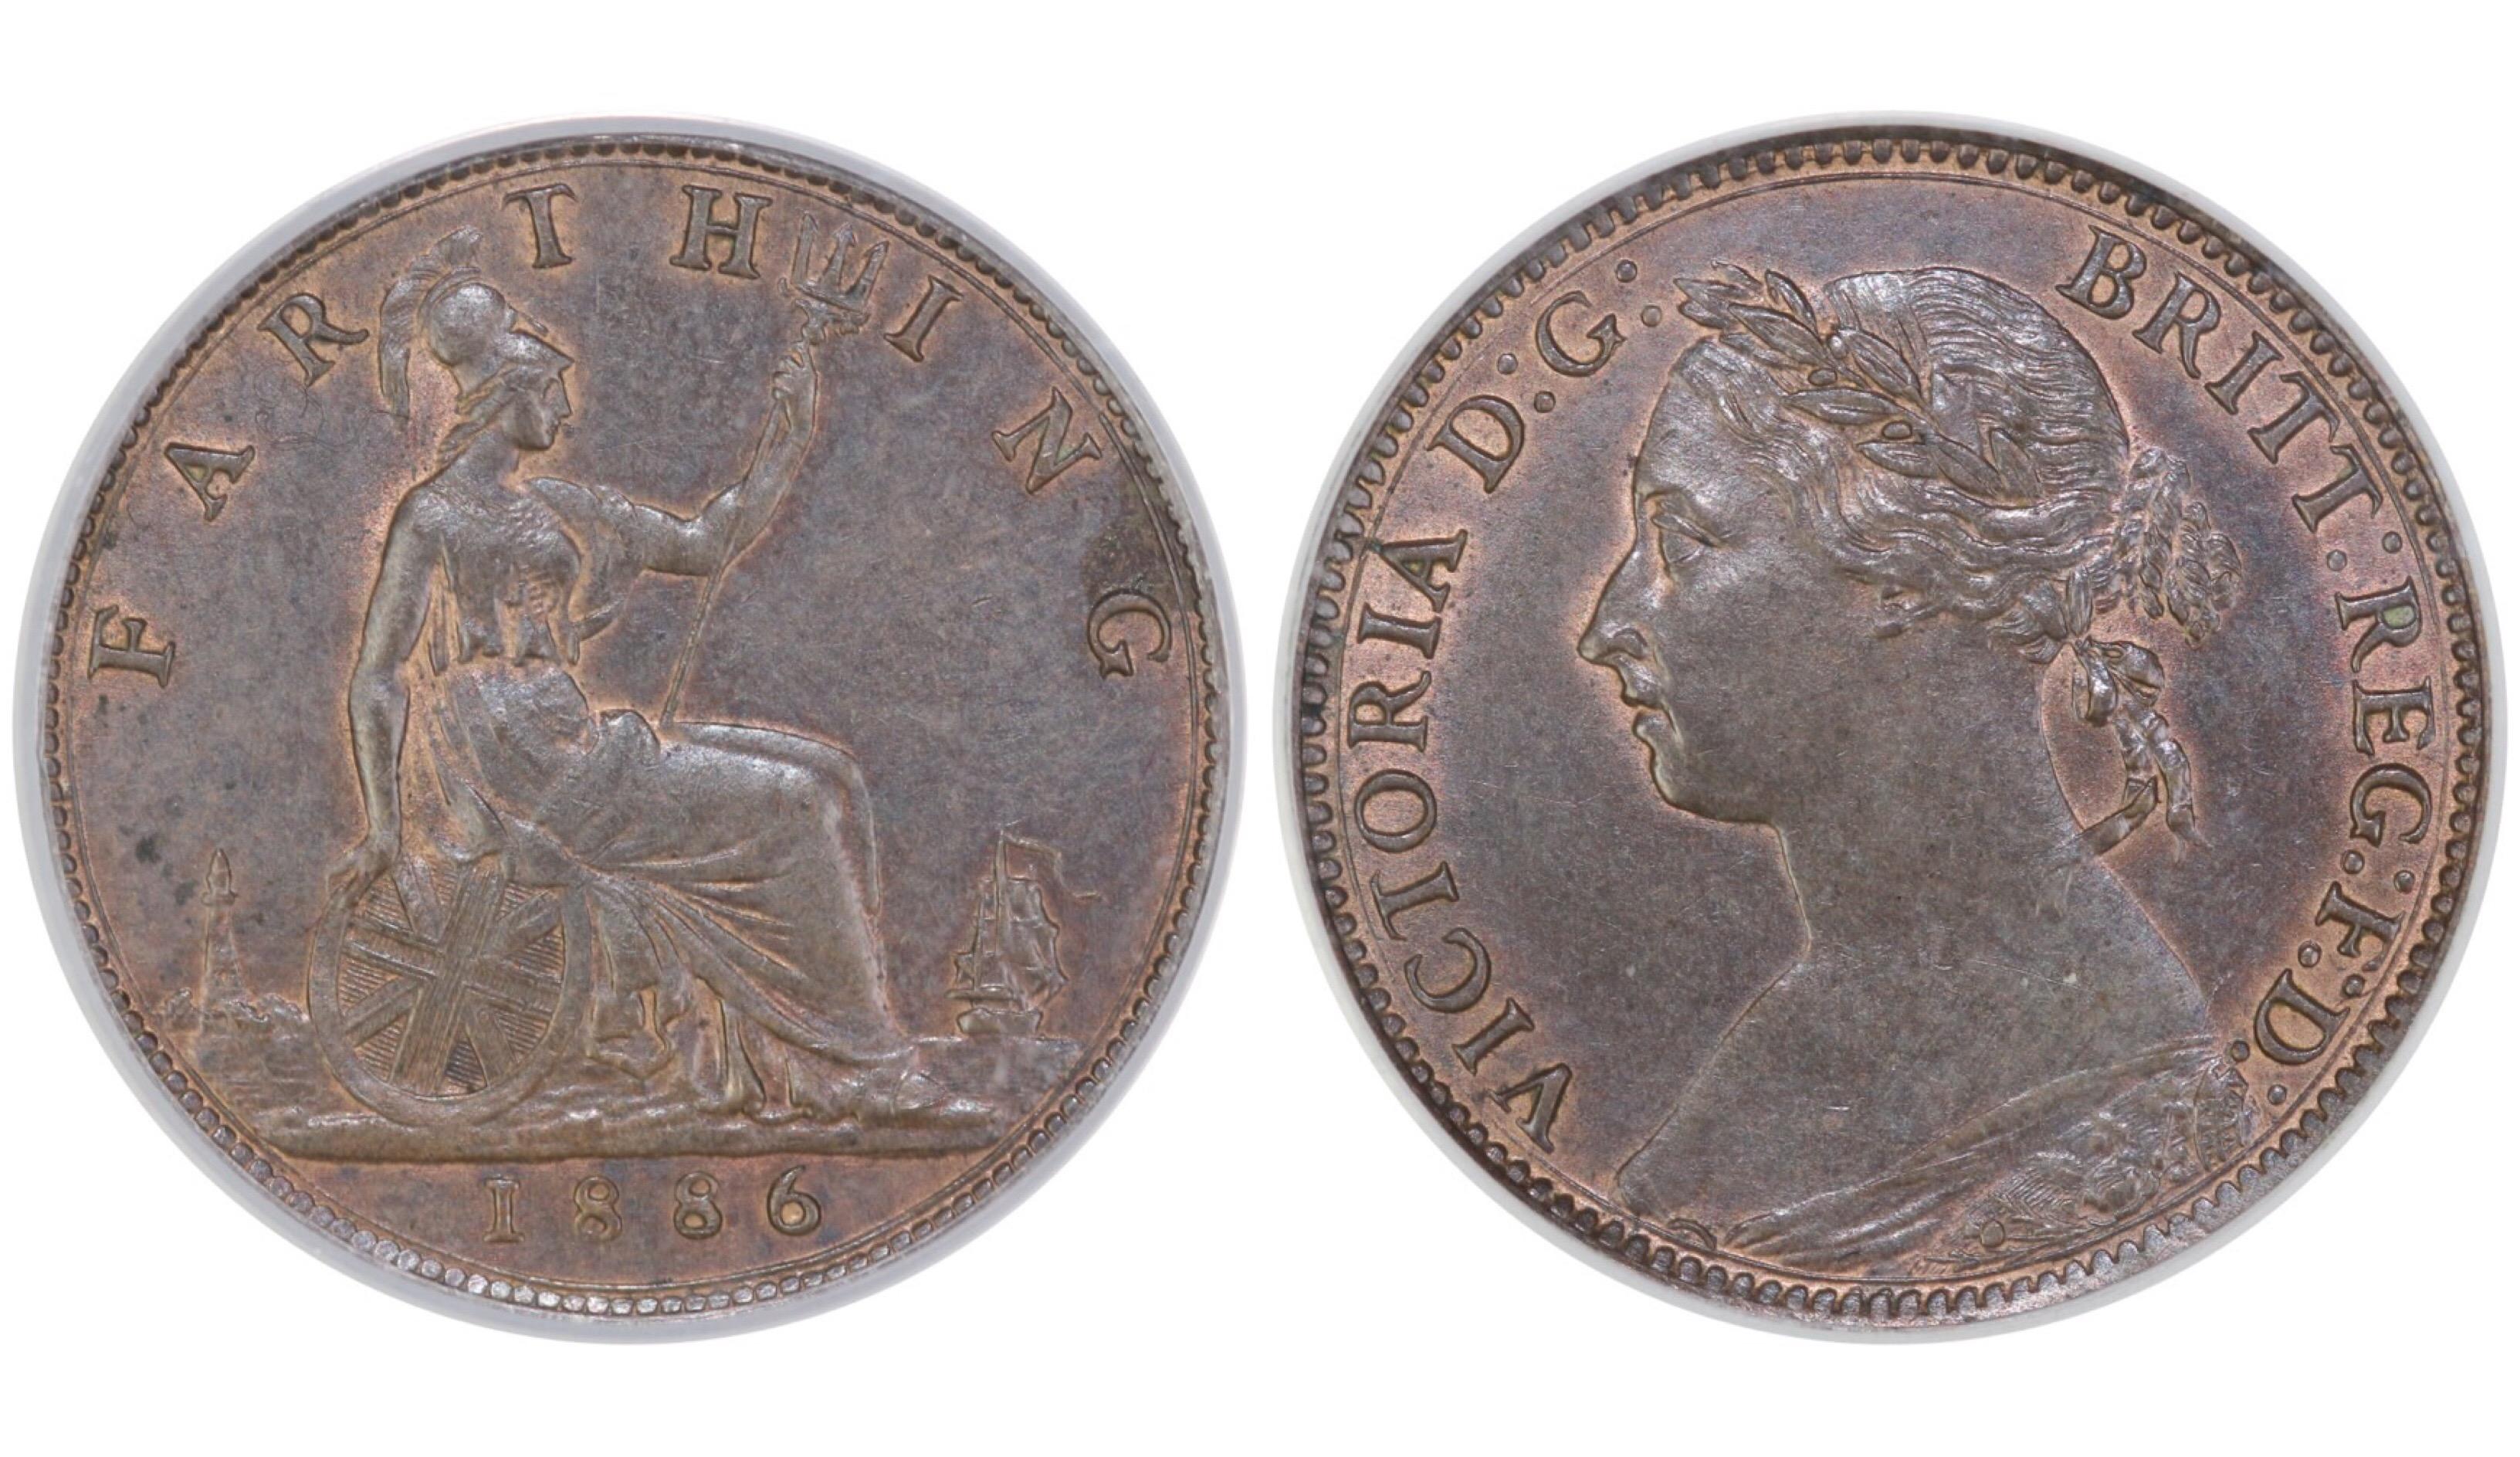 1886 Farthing, CGS 78, Victoria, Freeman 557, UIN 22671